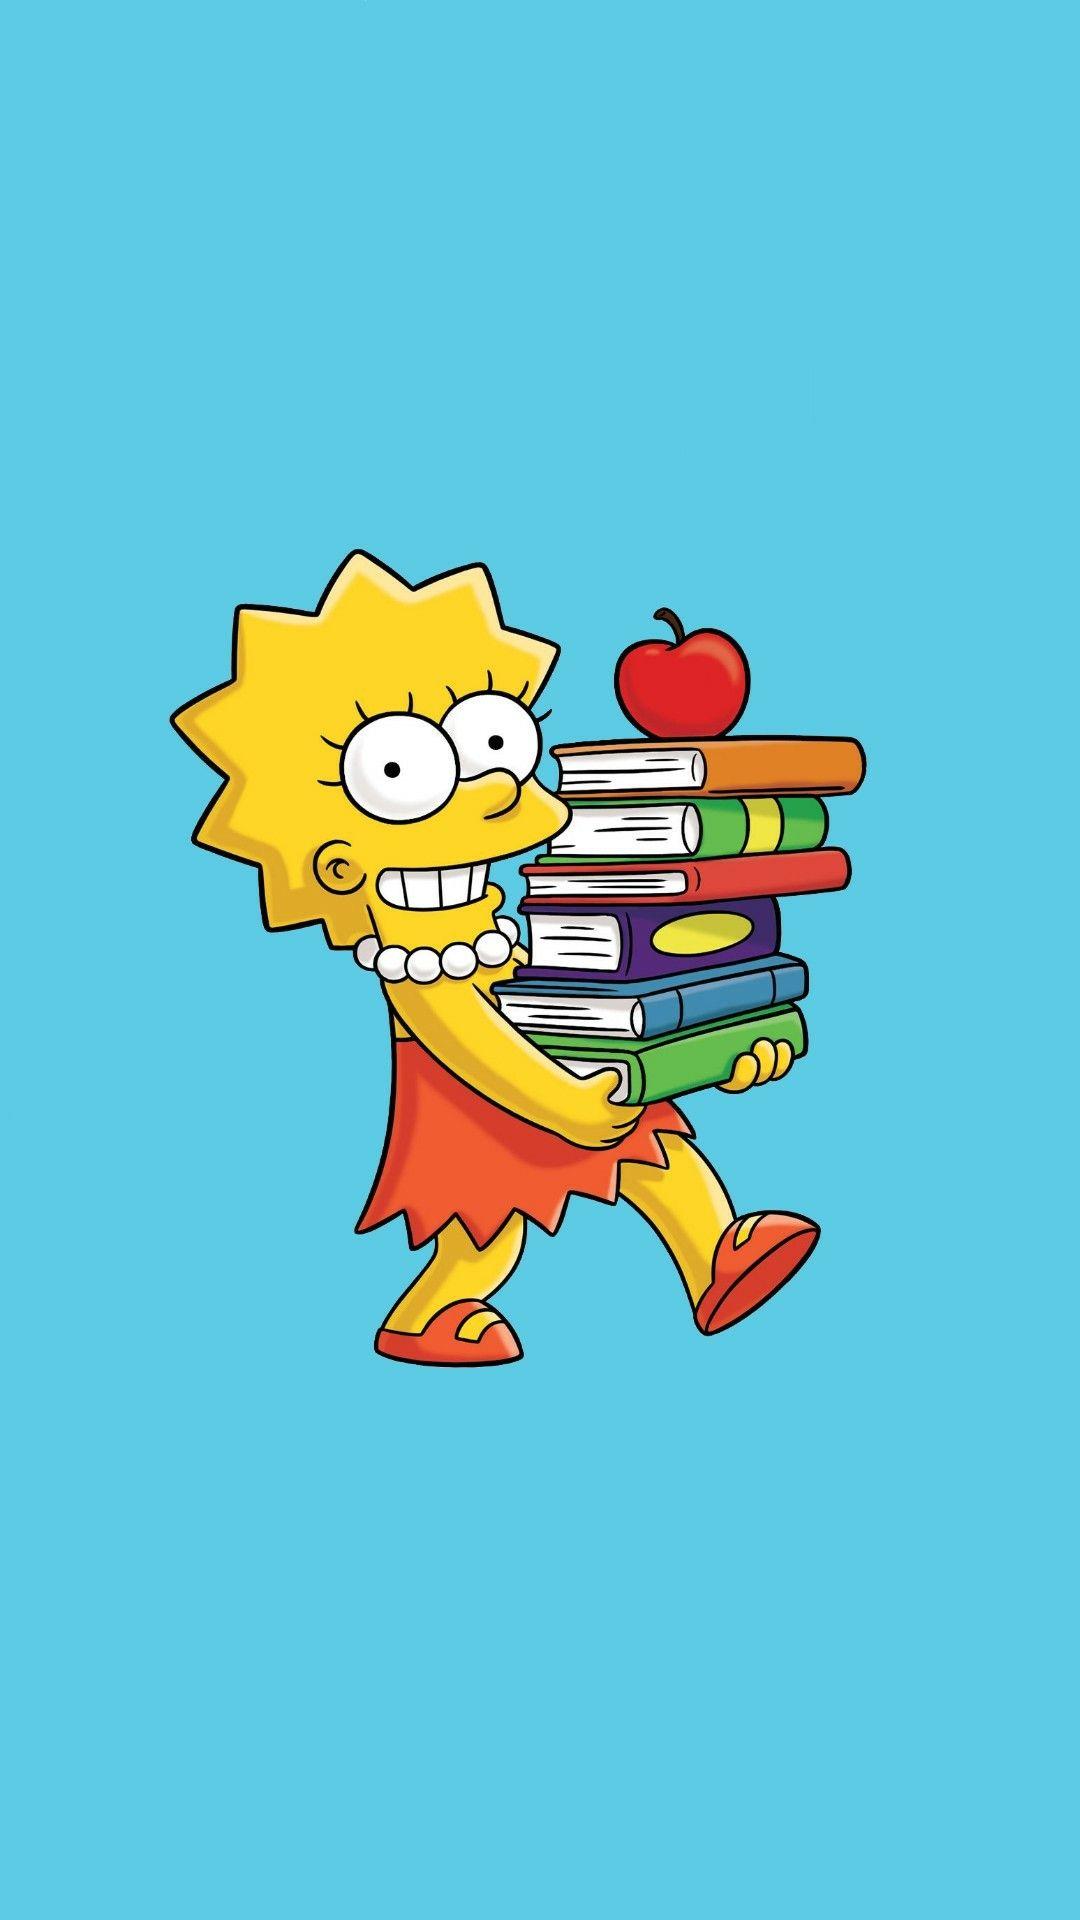 Wallpaper The Simpsons 1 Papeis de parede, Desenho dos